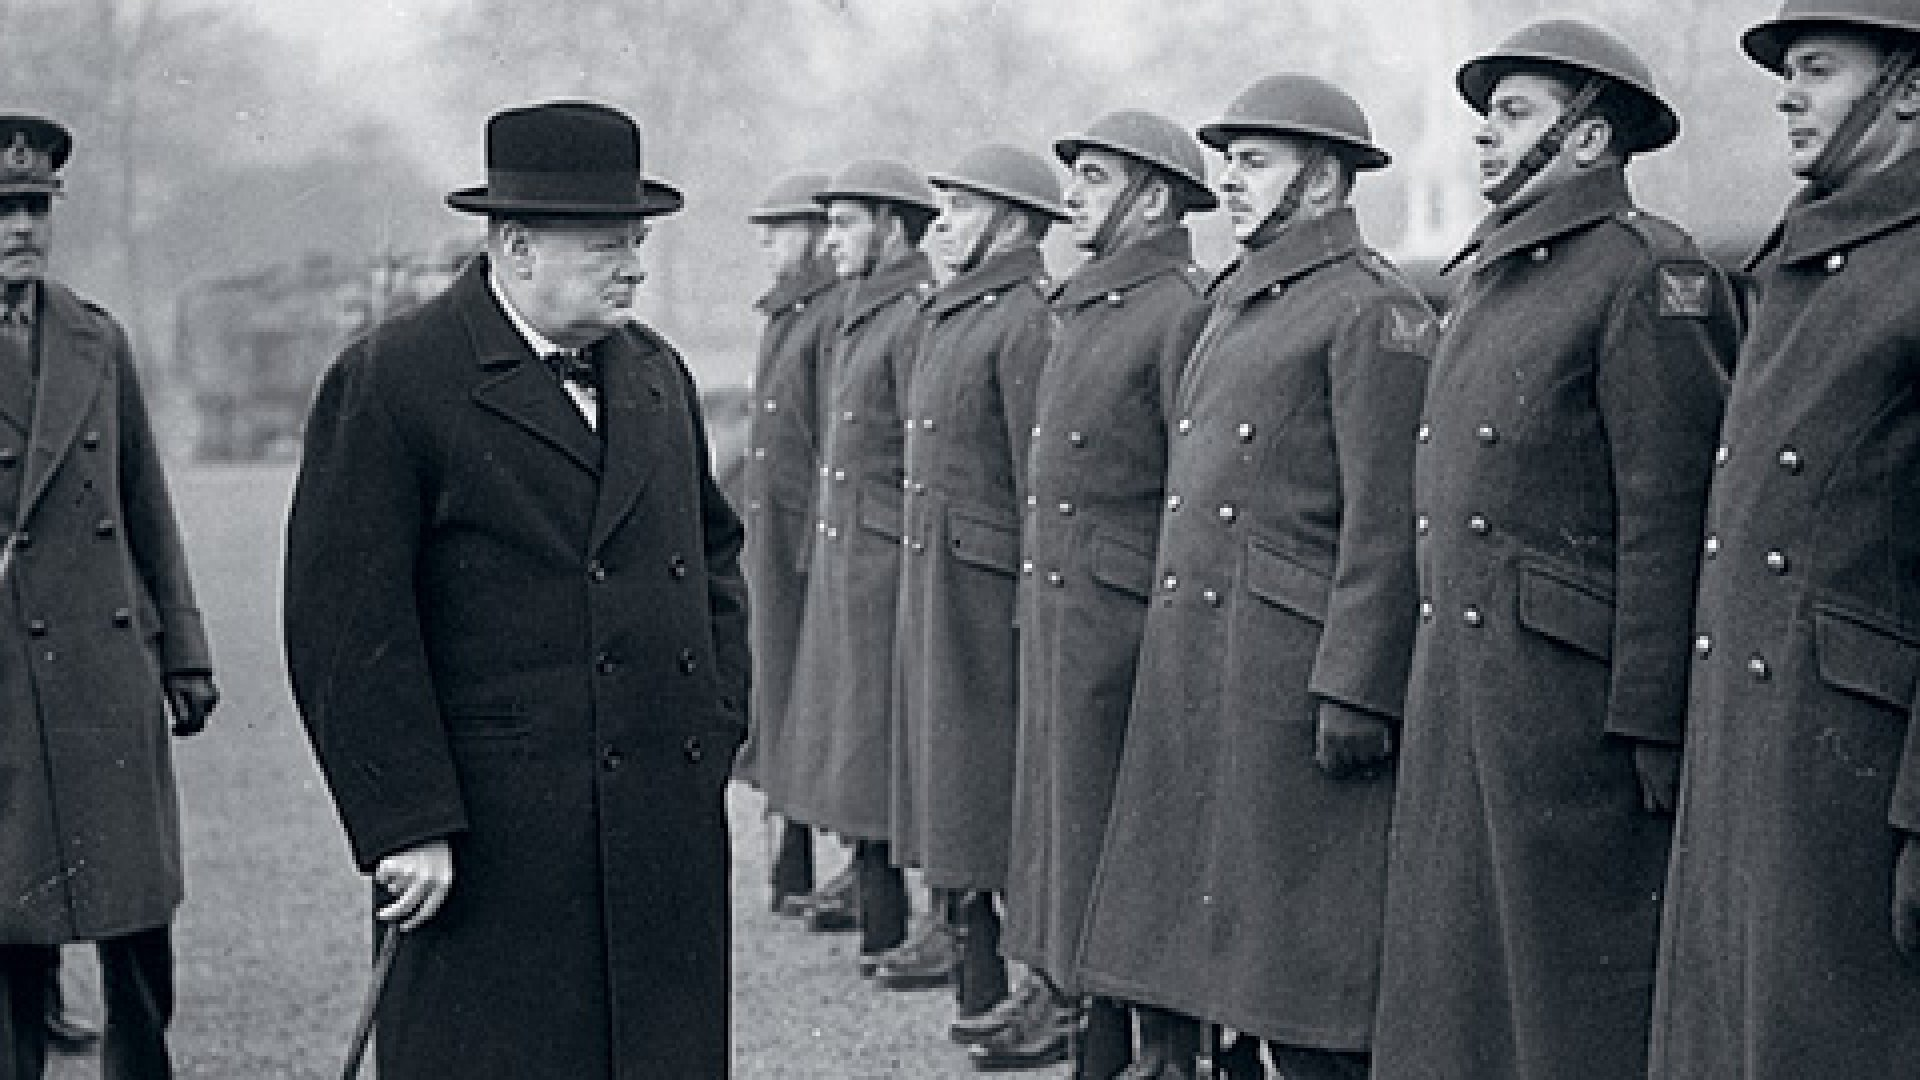 <b>Listen Up</b> Winston Churchill inspects British troops in 1941.